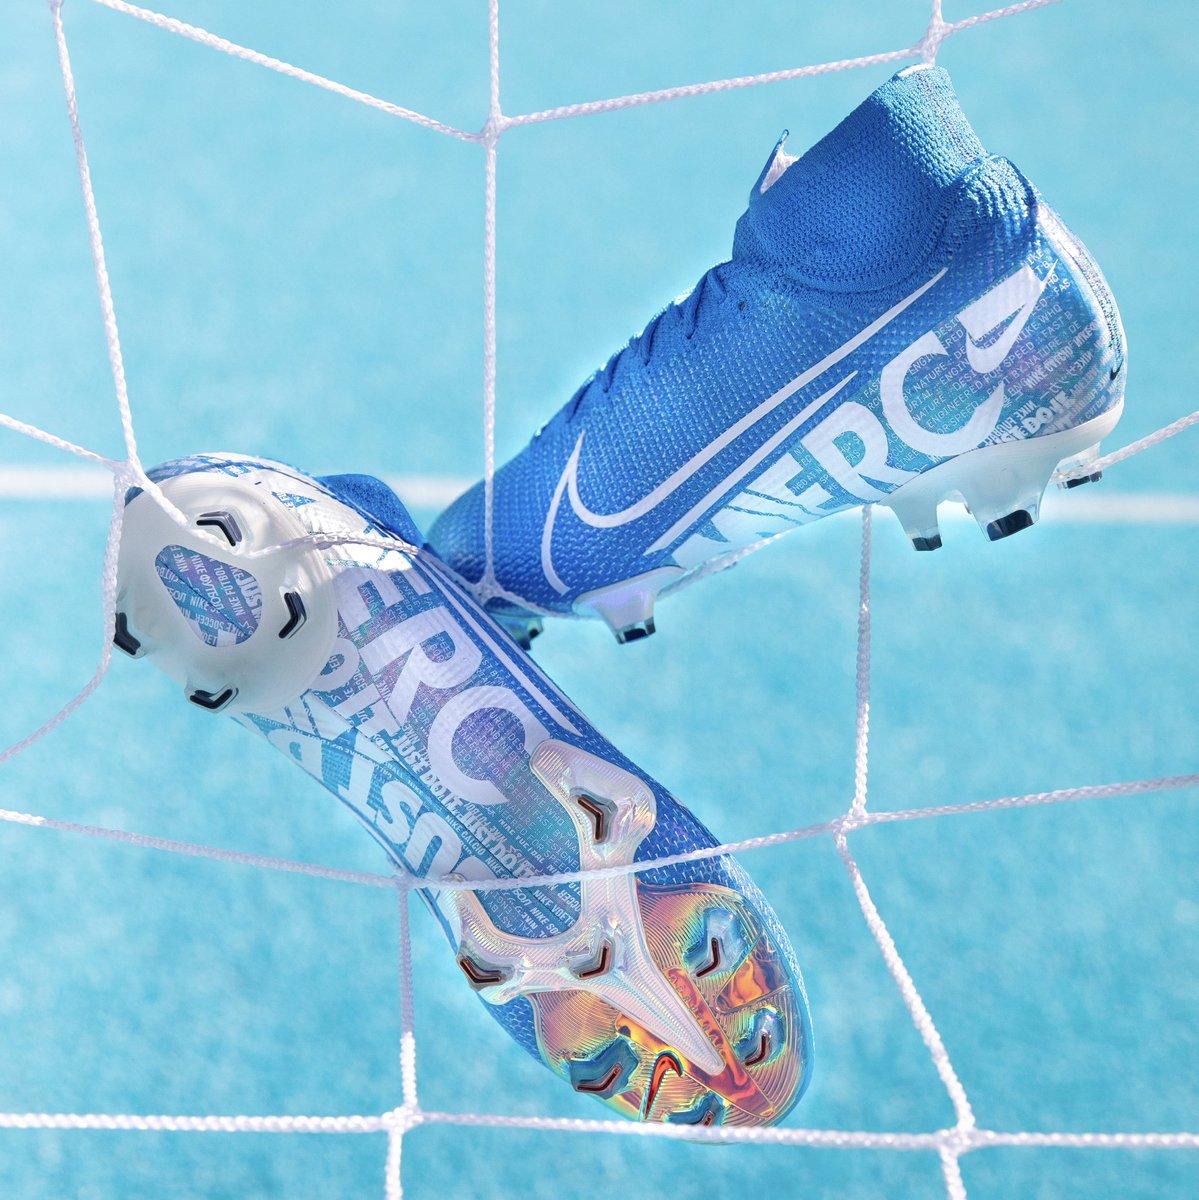 Nike Football on Twitter: